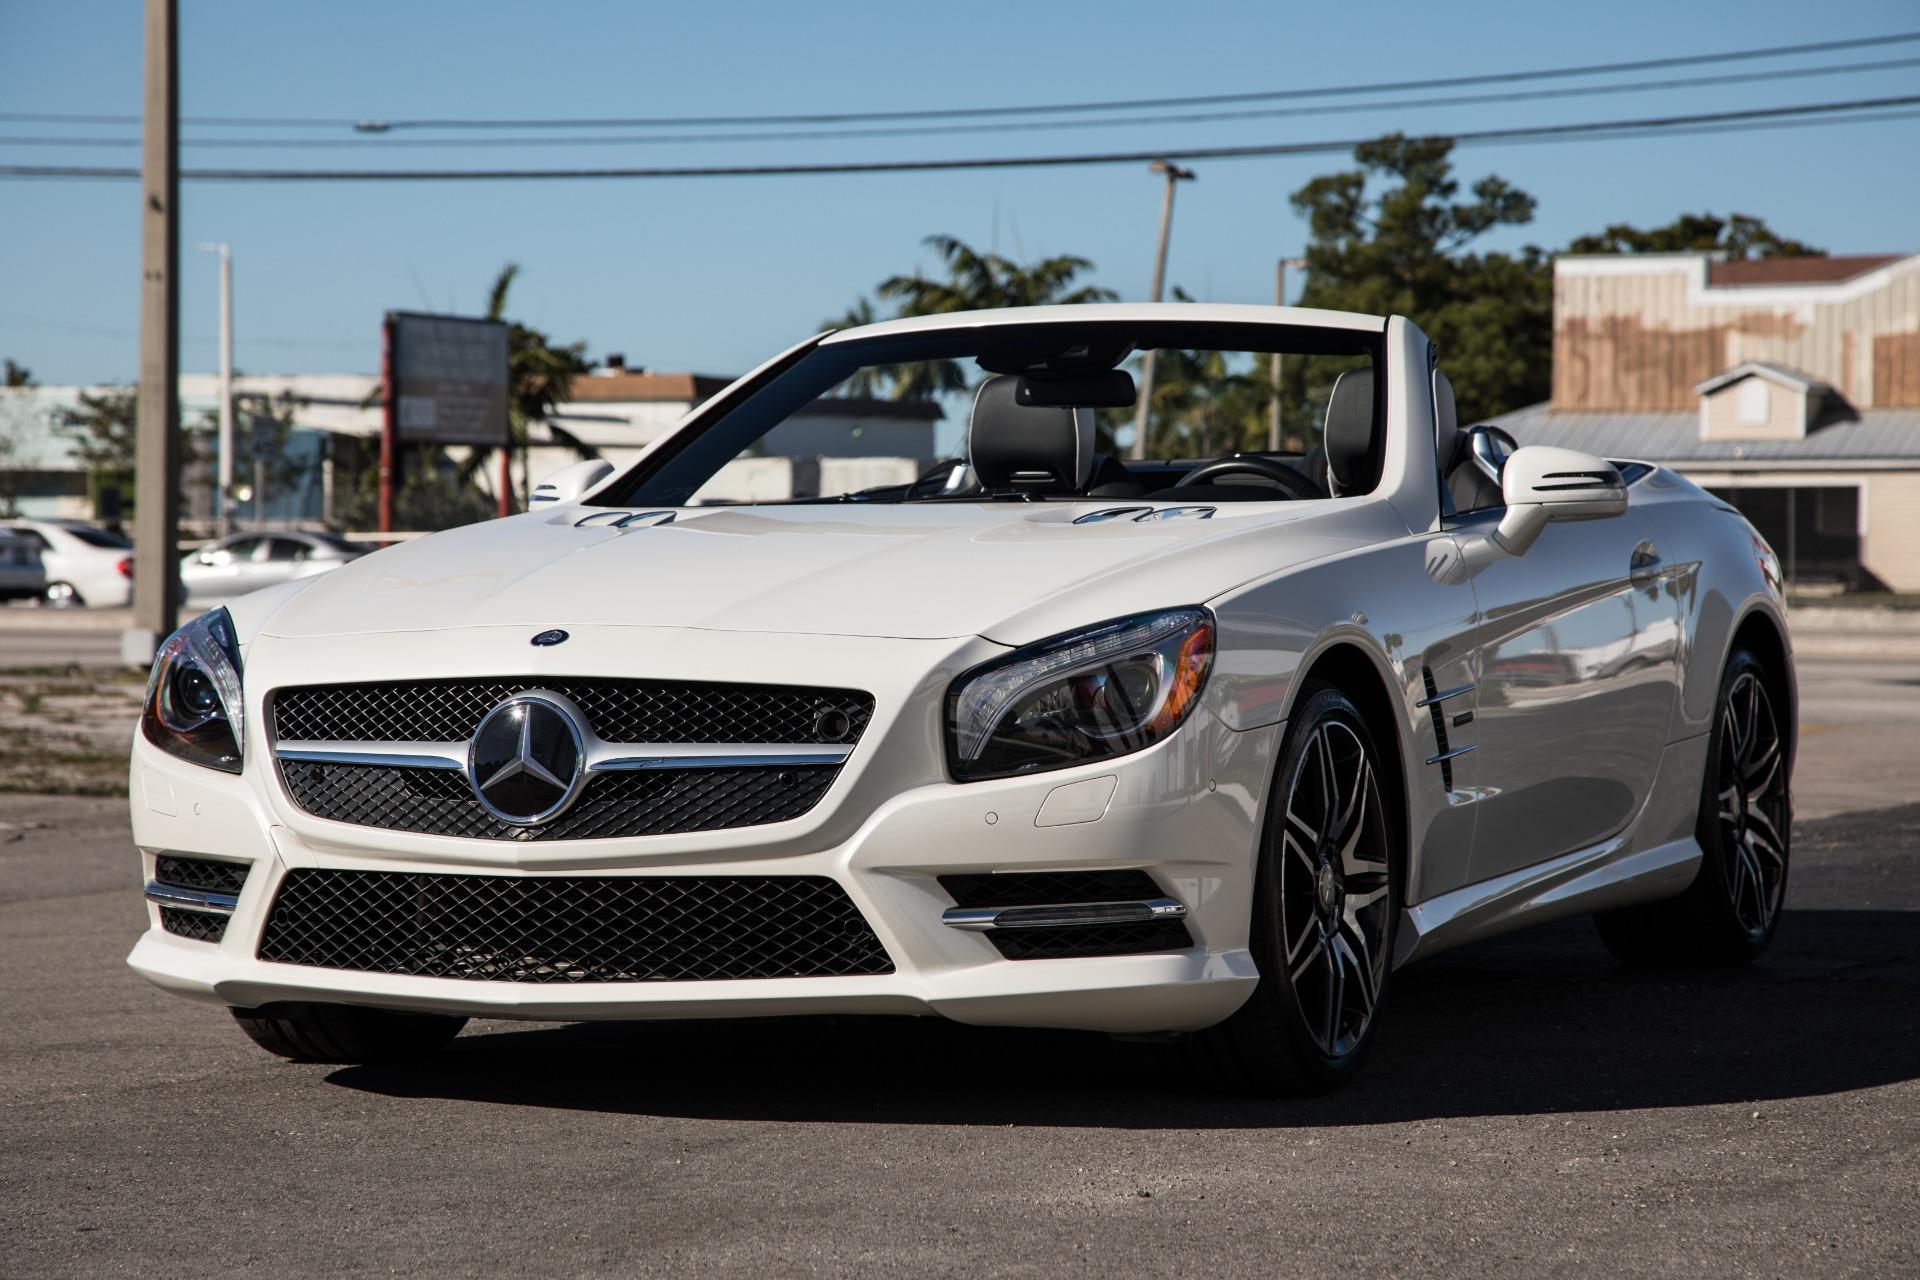 Used-2015-Mercedes-Benz-SL-Class-SL-550